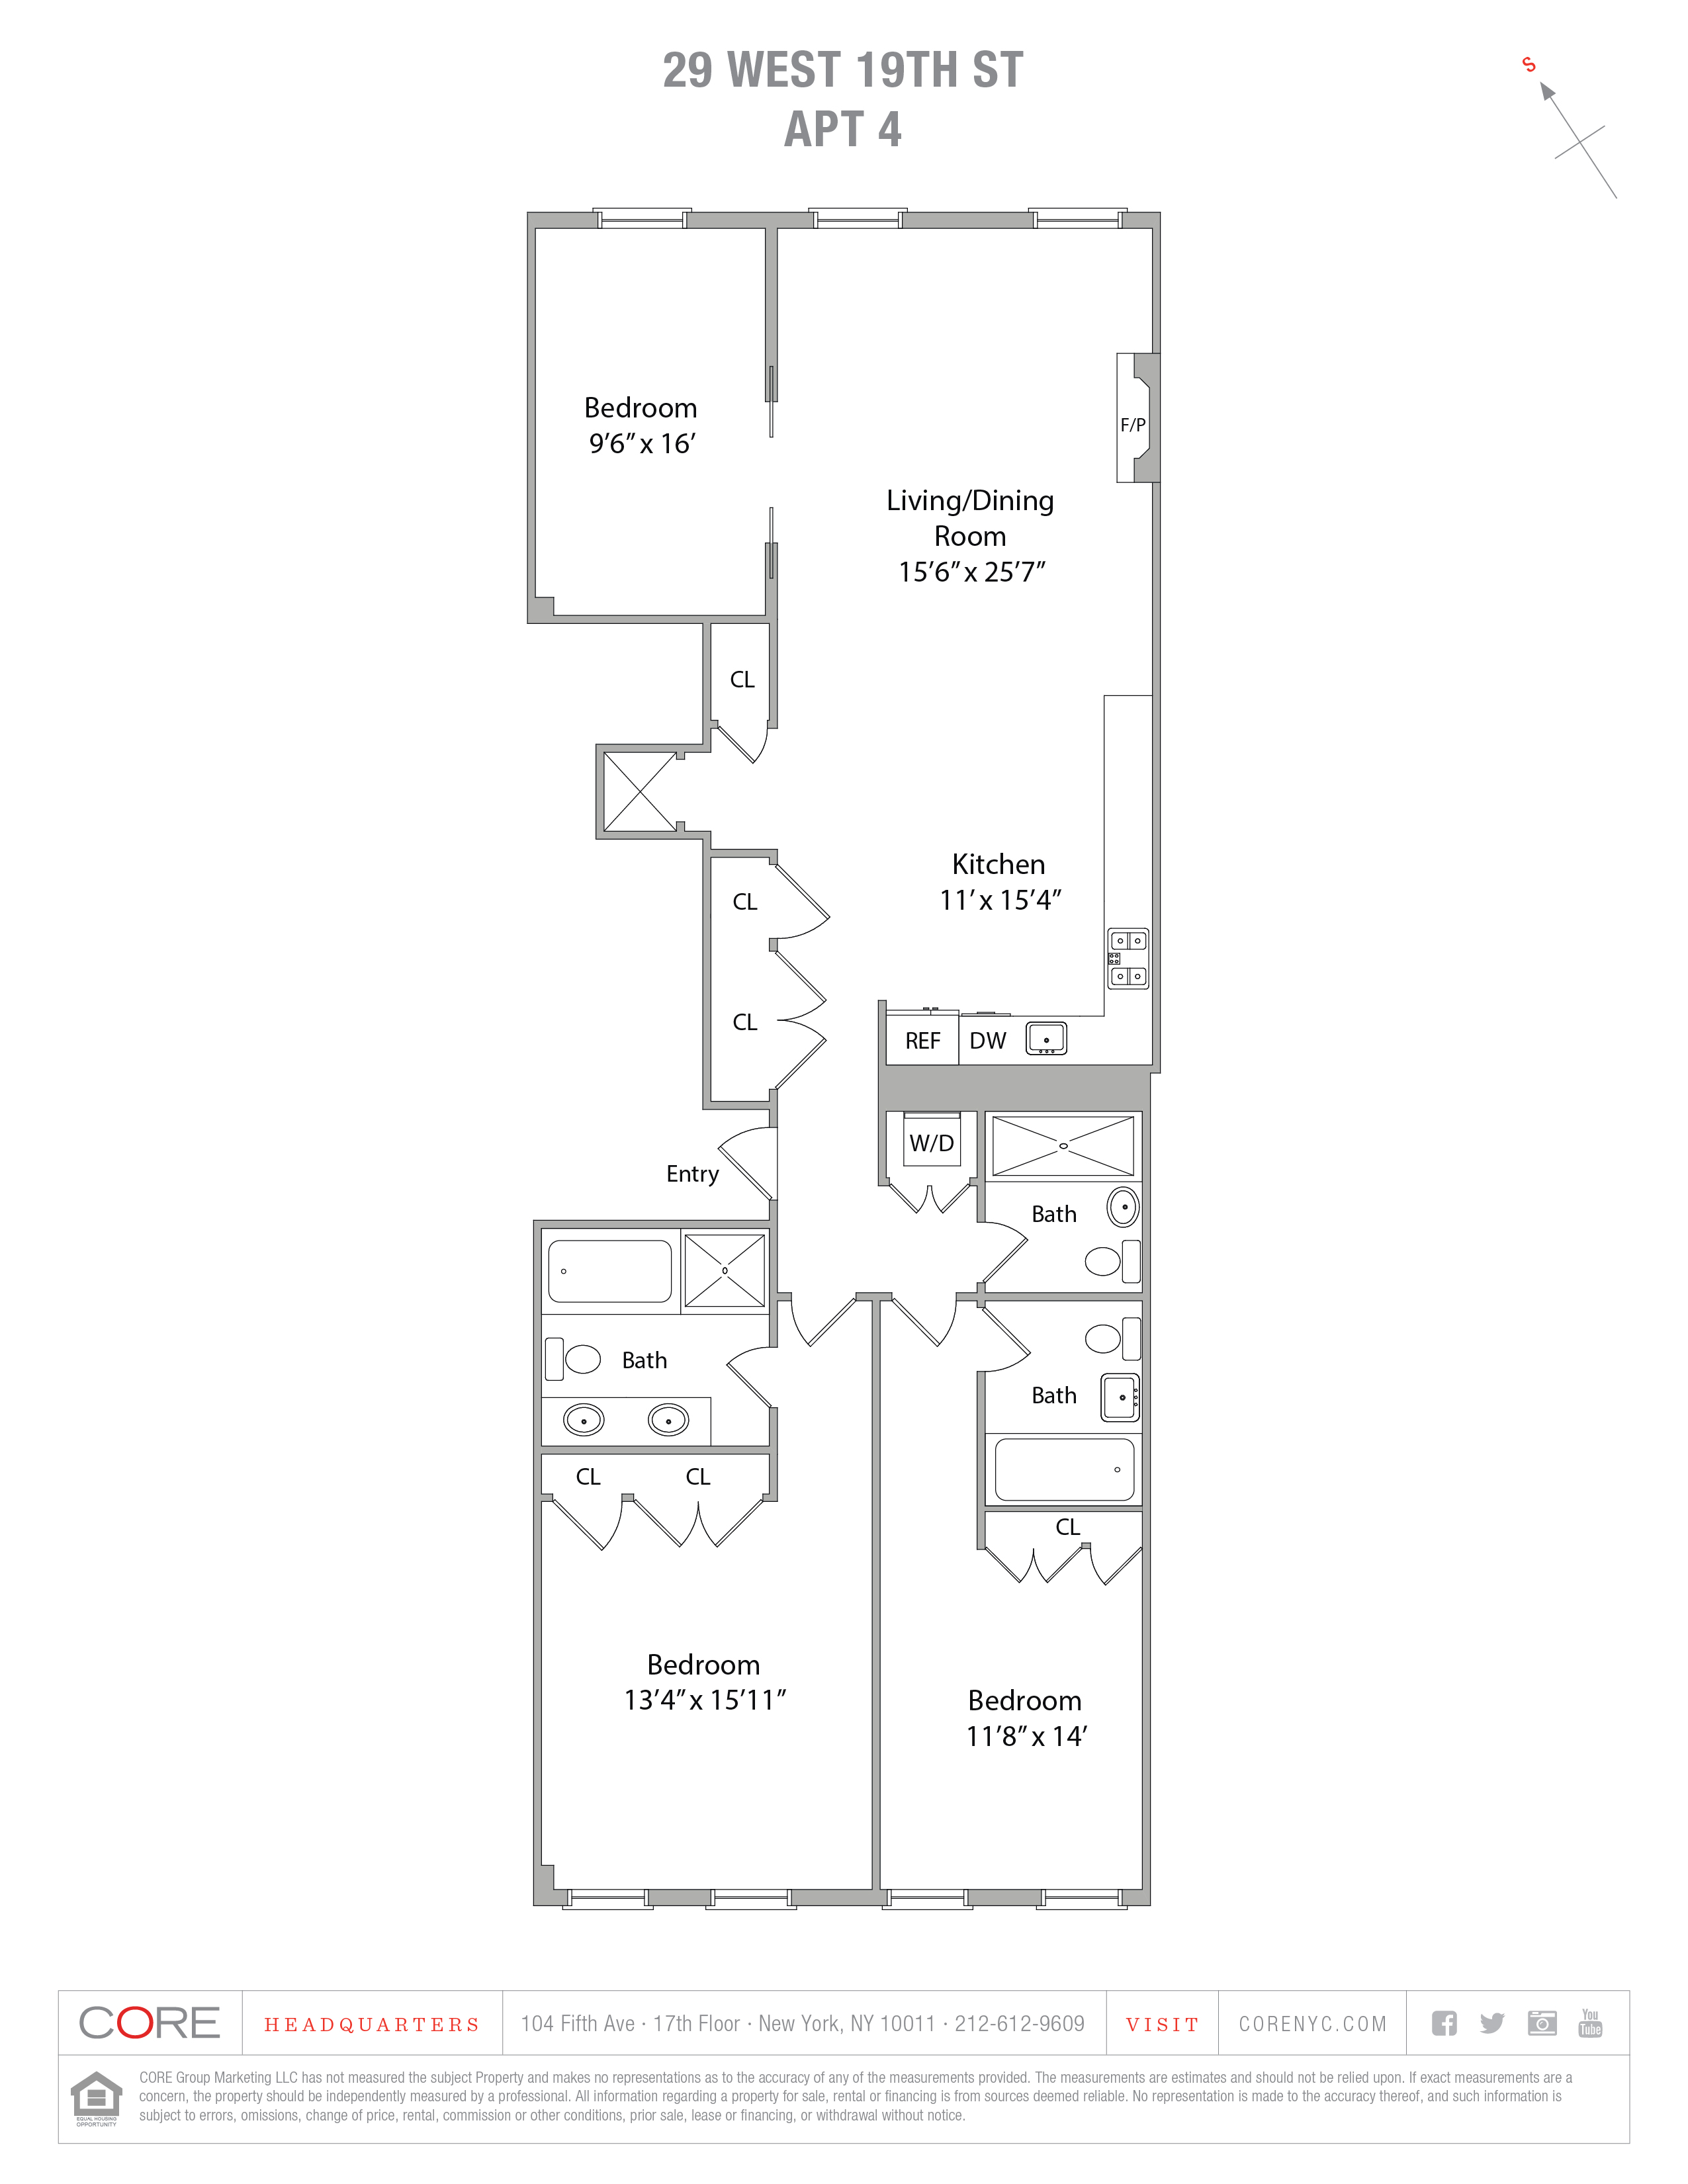 29 West 19th St. 4th Floor, New York, NY 10011